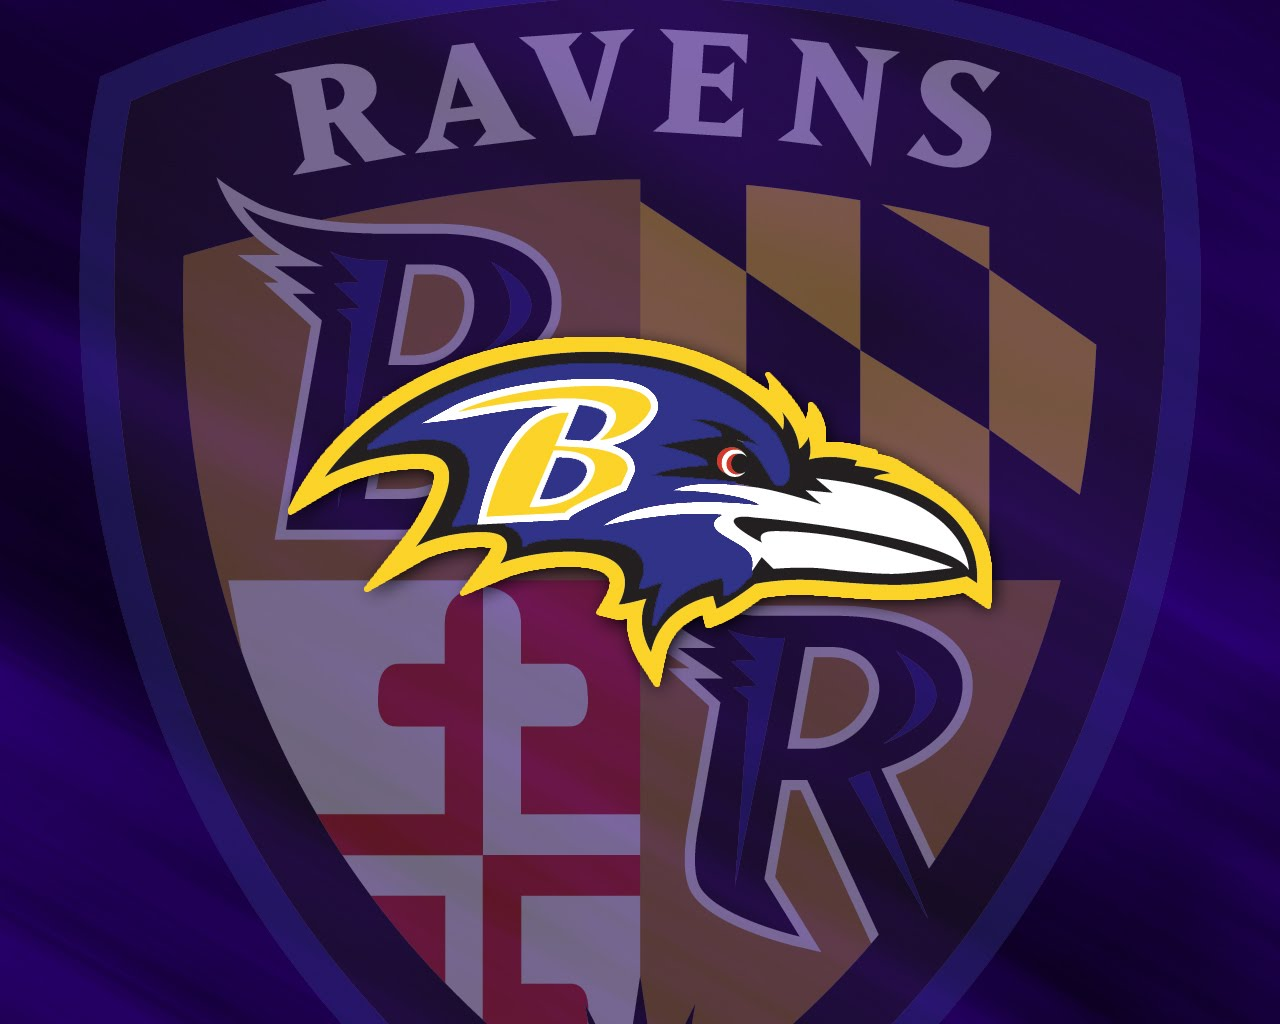 Ravens Home S  E